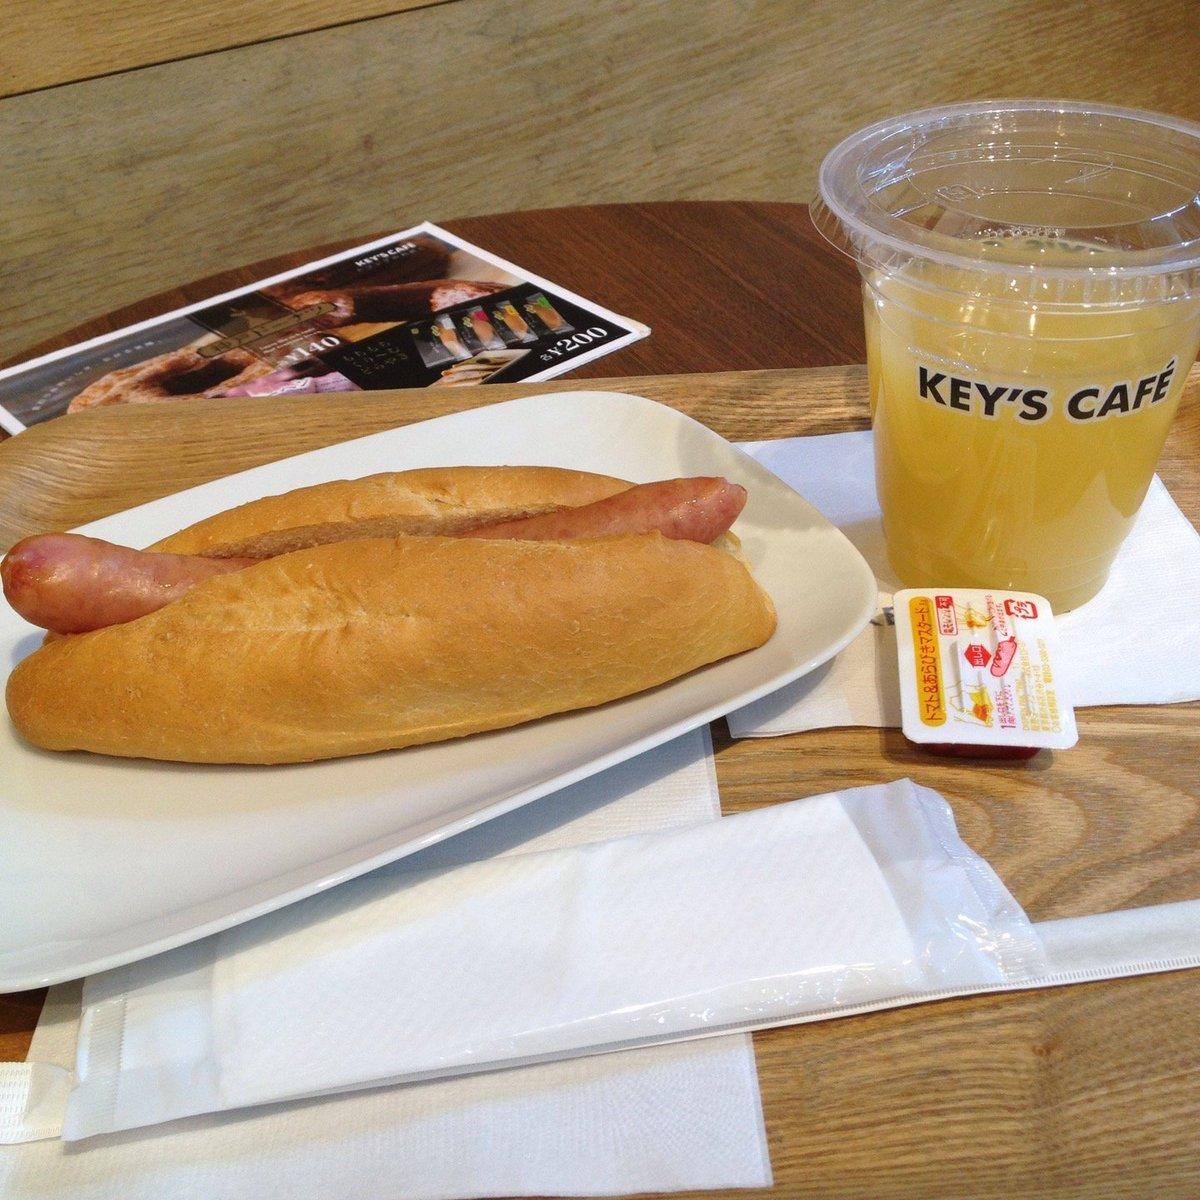 KEY'S CAFE(キーズ・カフェ)ビックカメラ名古屋JRゲートタワー店 モーニング(りんごジュース、ホットドッグ)